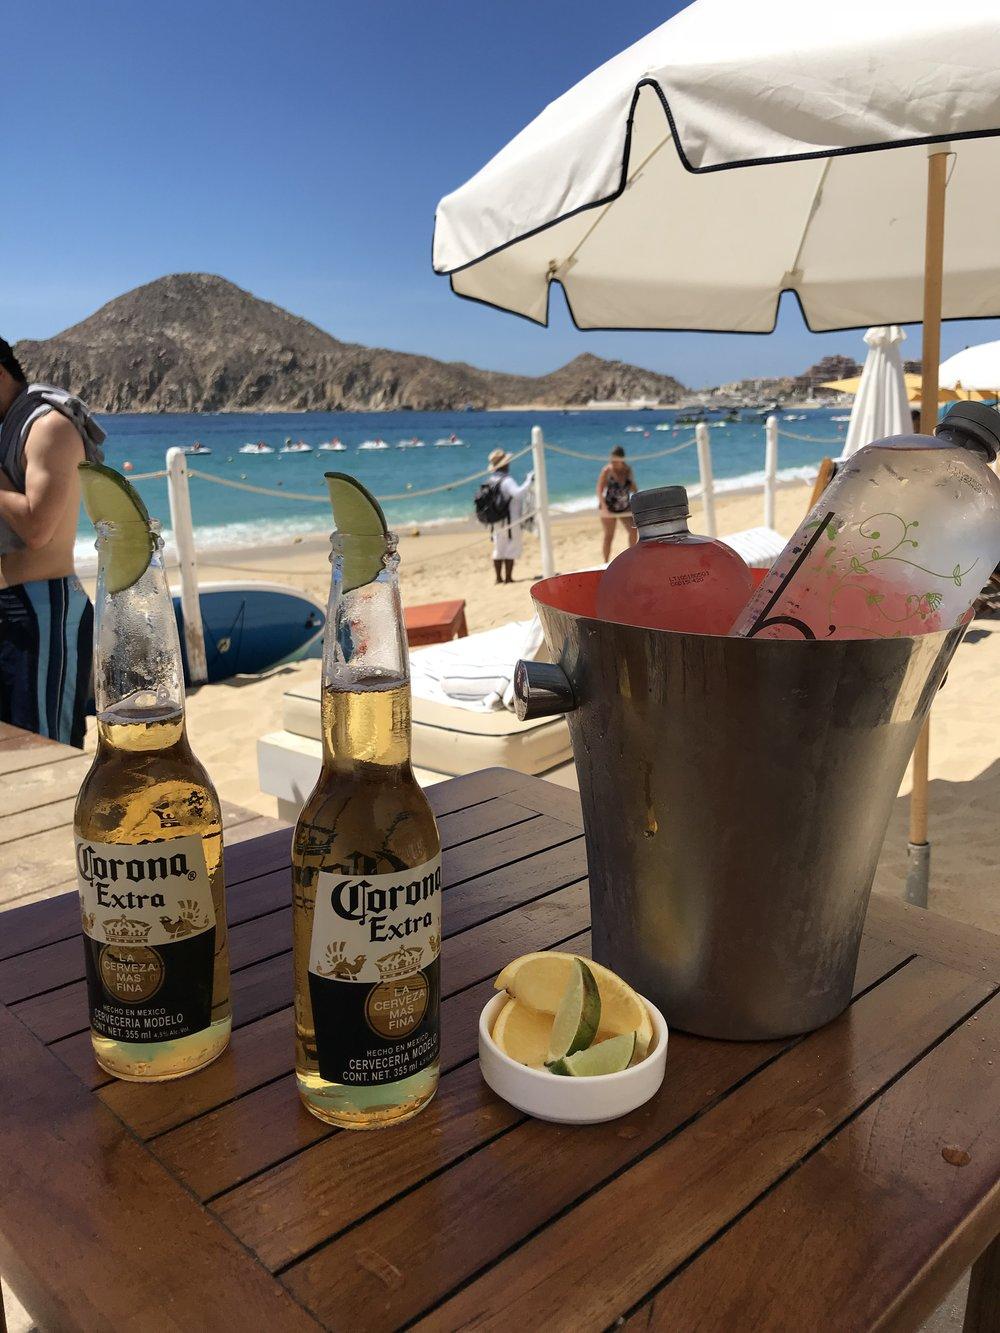 Bahia Hotel and Beach House, Los Cabos